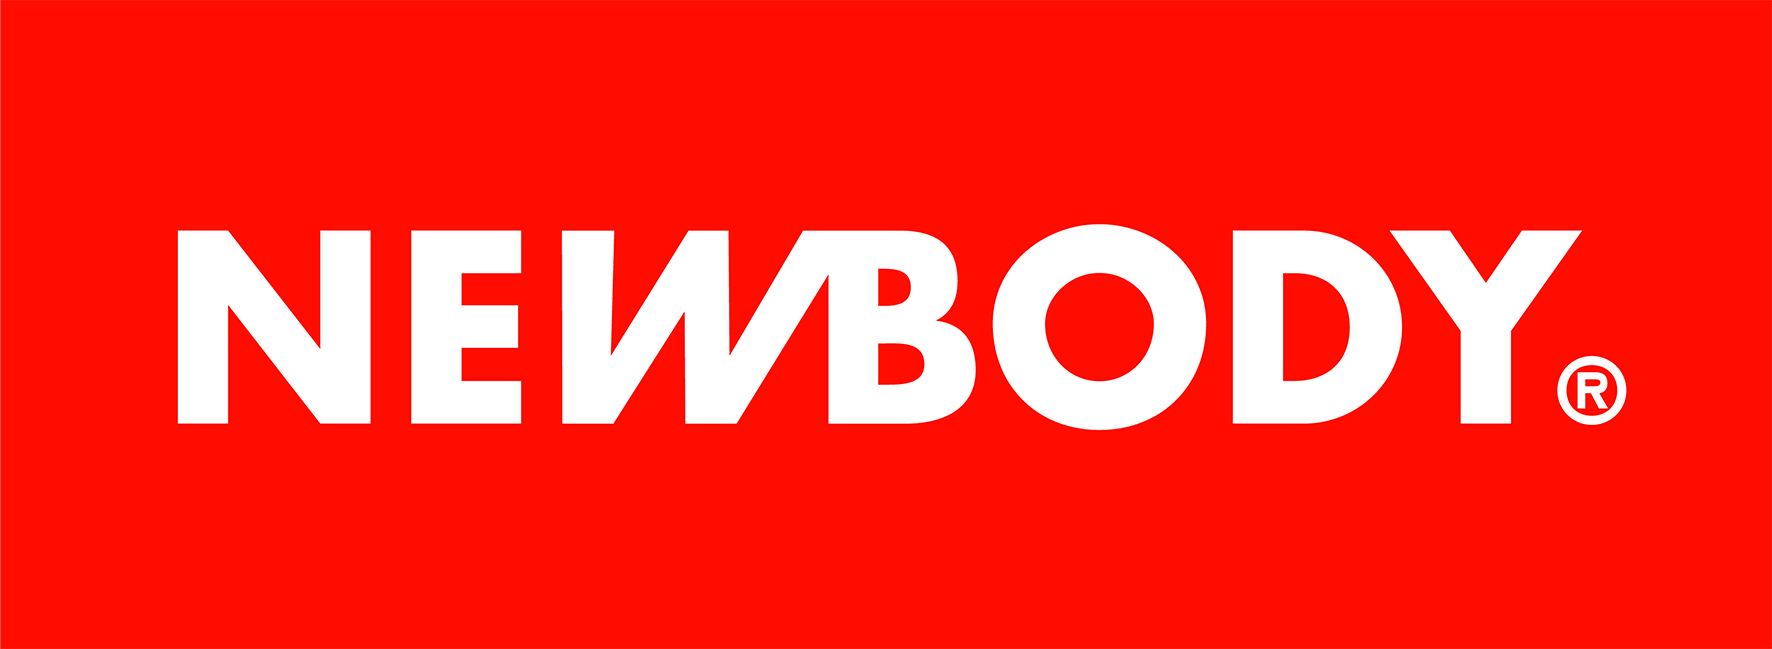 https://stadicup.fi/wp-content/uploads/2020/03/Newbody_logo_b_PMS.jpg